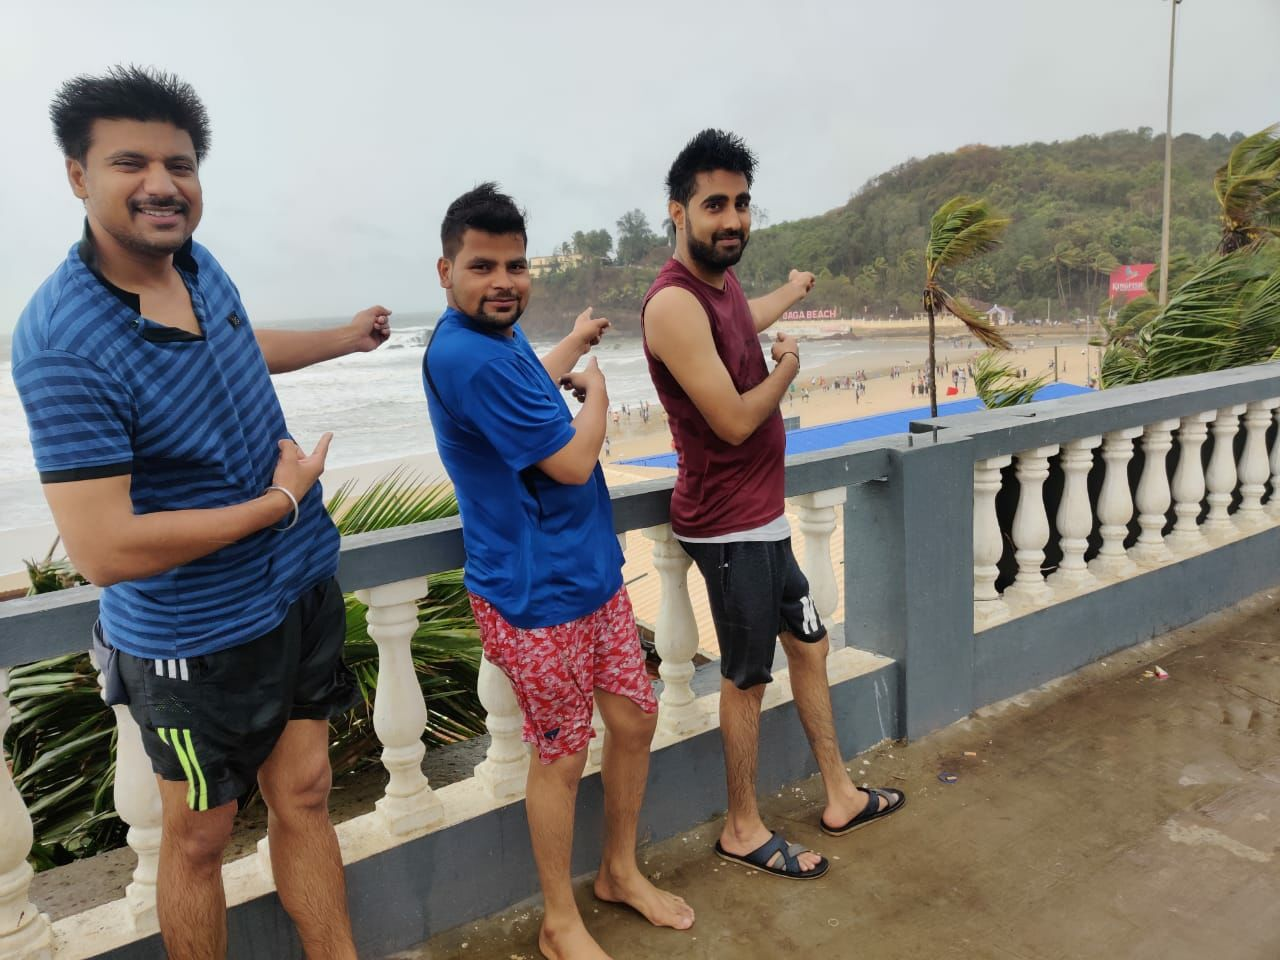 Photo of Goa By yashwant paliwal